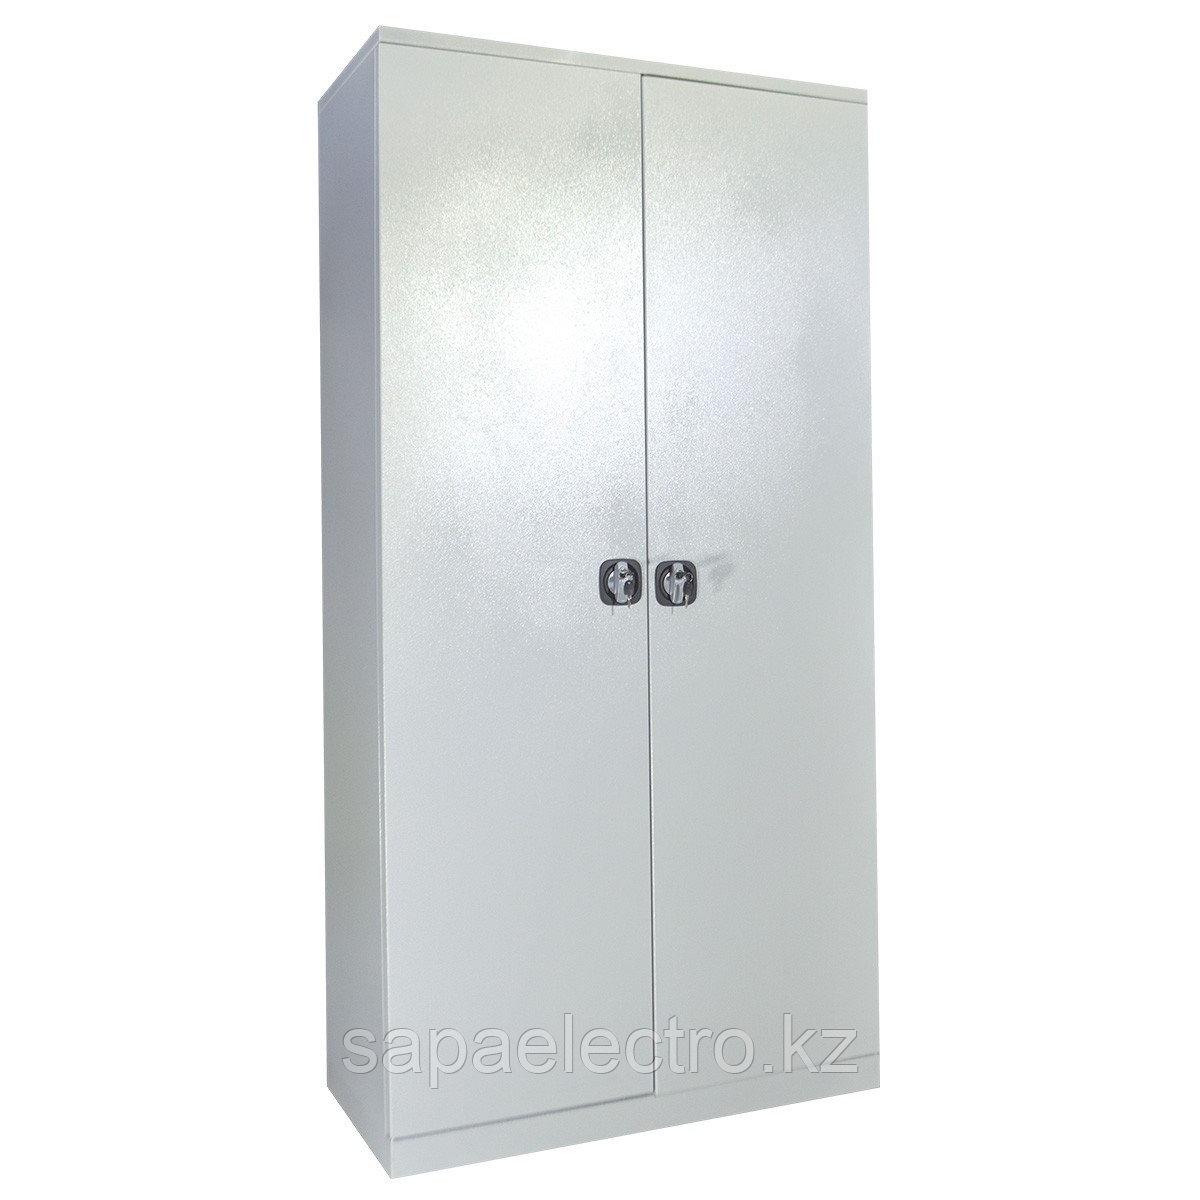 Металл.Шкаф 2-х корп.4полки/2перекладины(900x1800x5